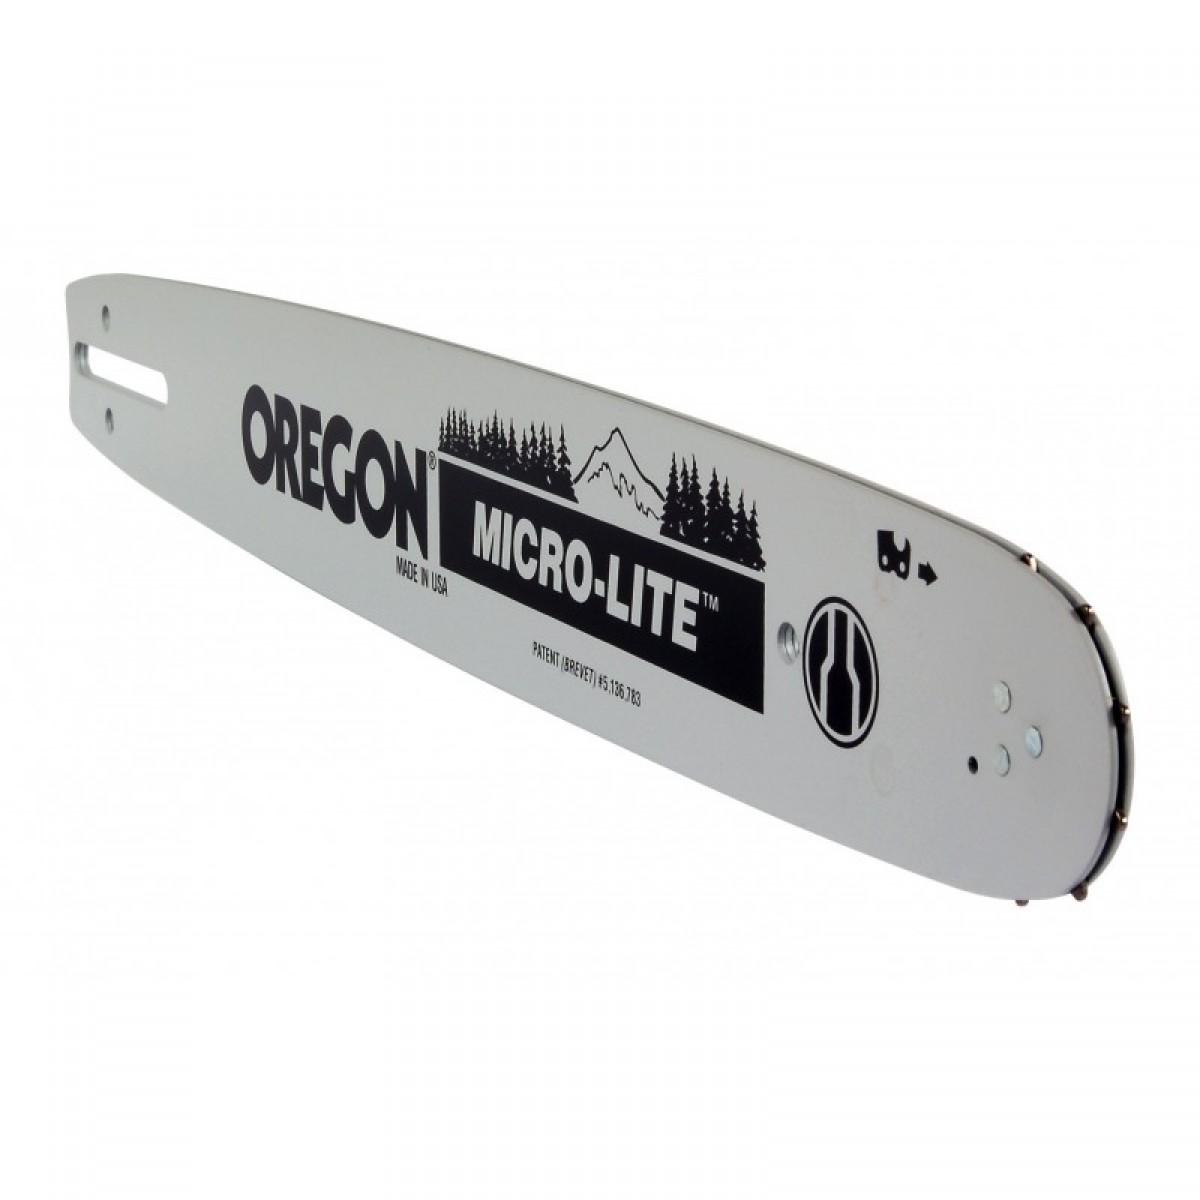 "Vodící lišta MICRO LITE 10"" (25cm) 3/8"" 1,1mm 104MLEA218"